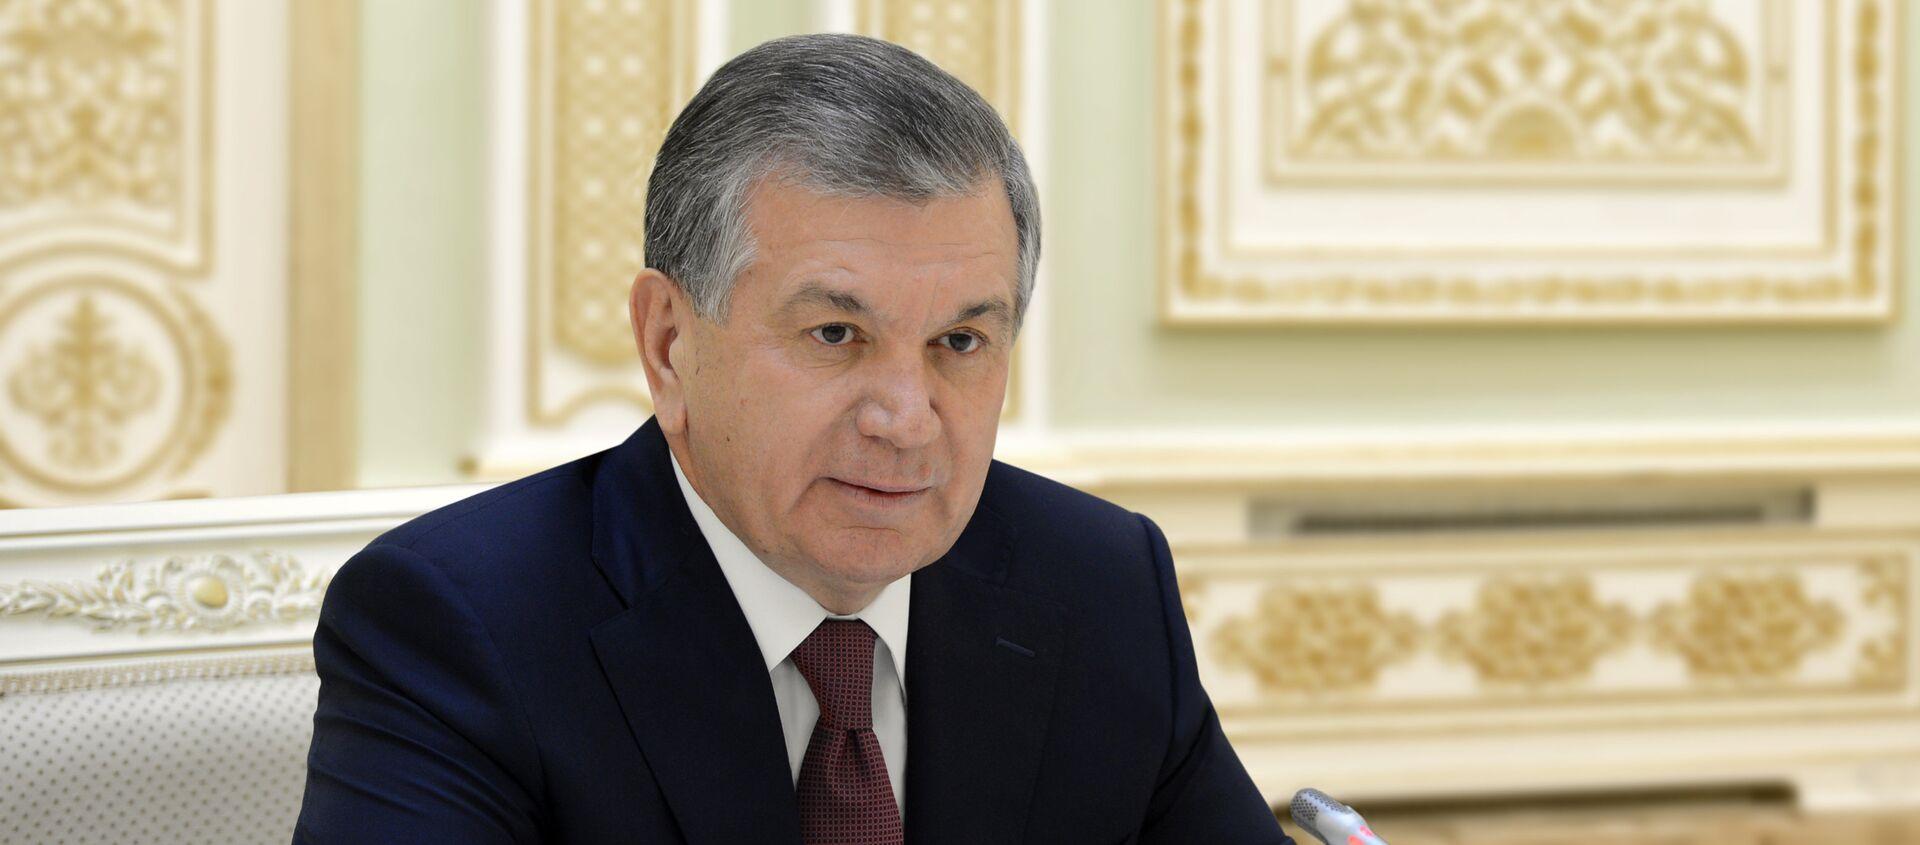 Prezident Uzbekistana Shavkat Mirziyoyev - Sputnik Oʻzbekiston, 1920, 14.02.2018